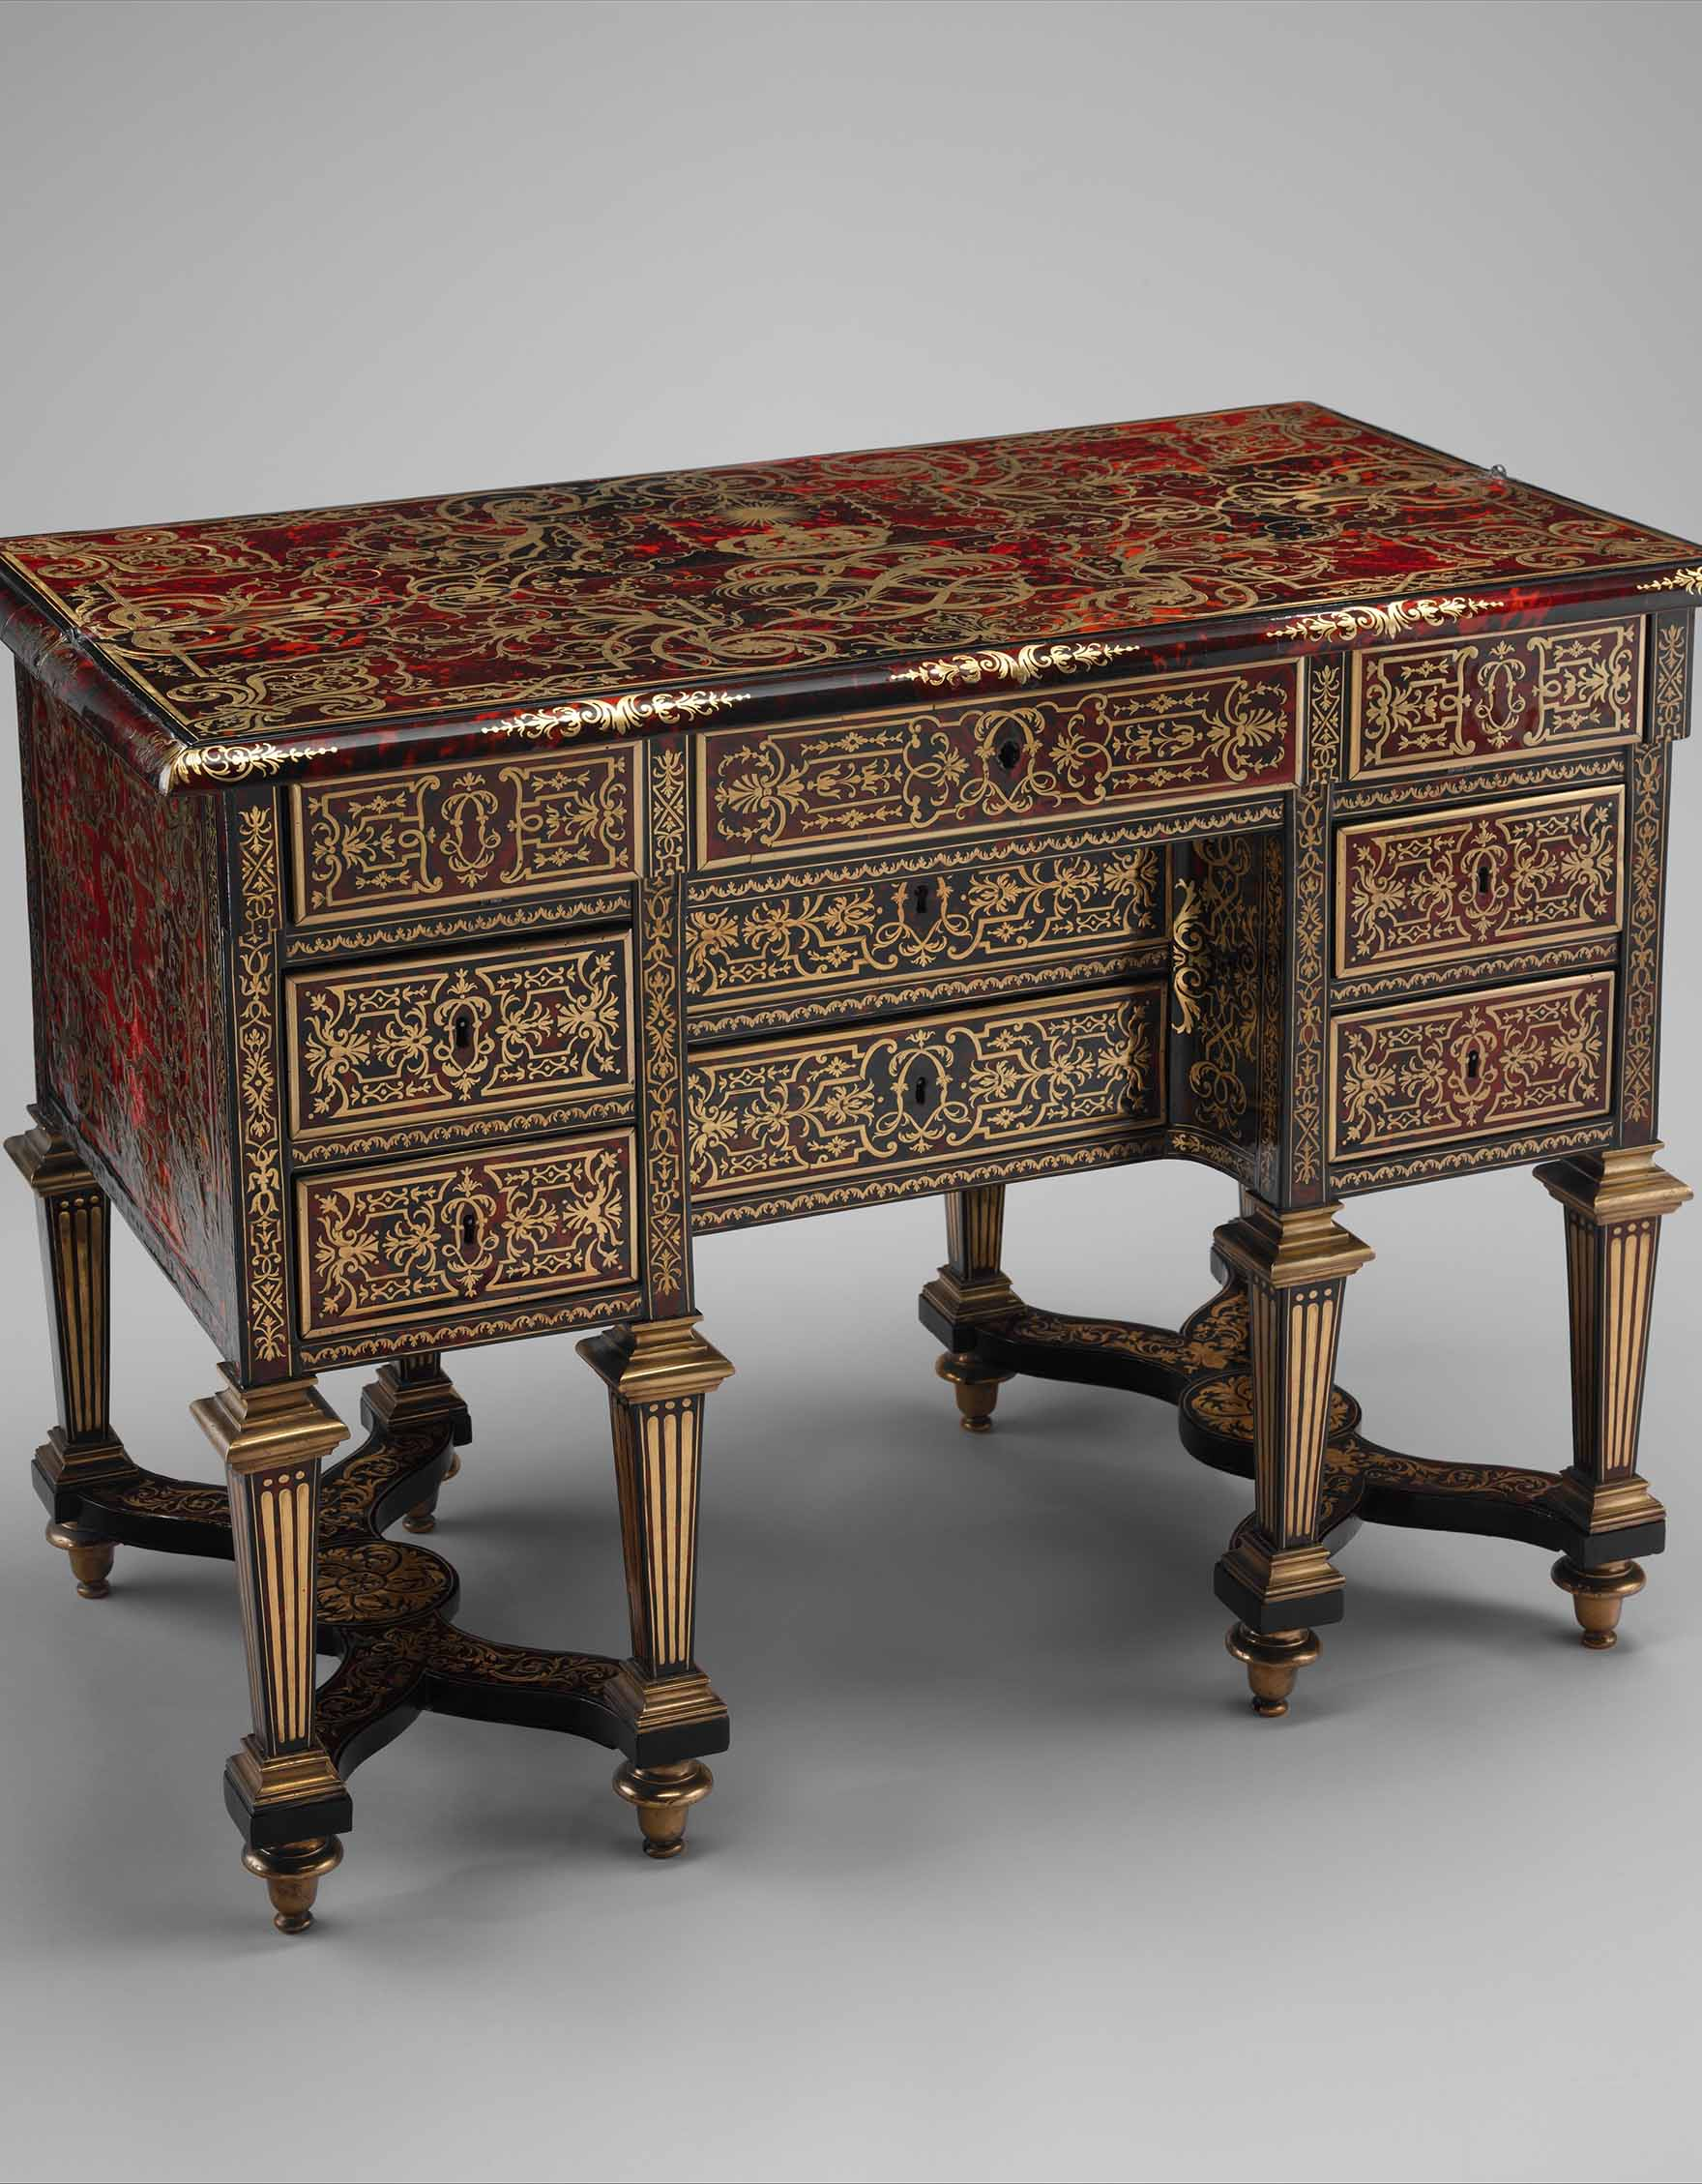 17th century desk